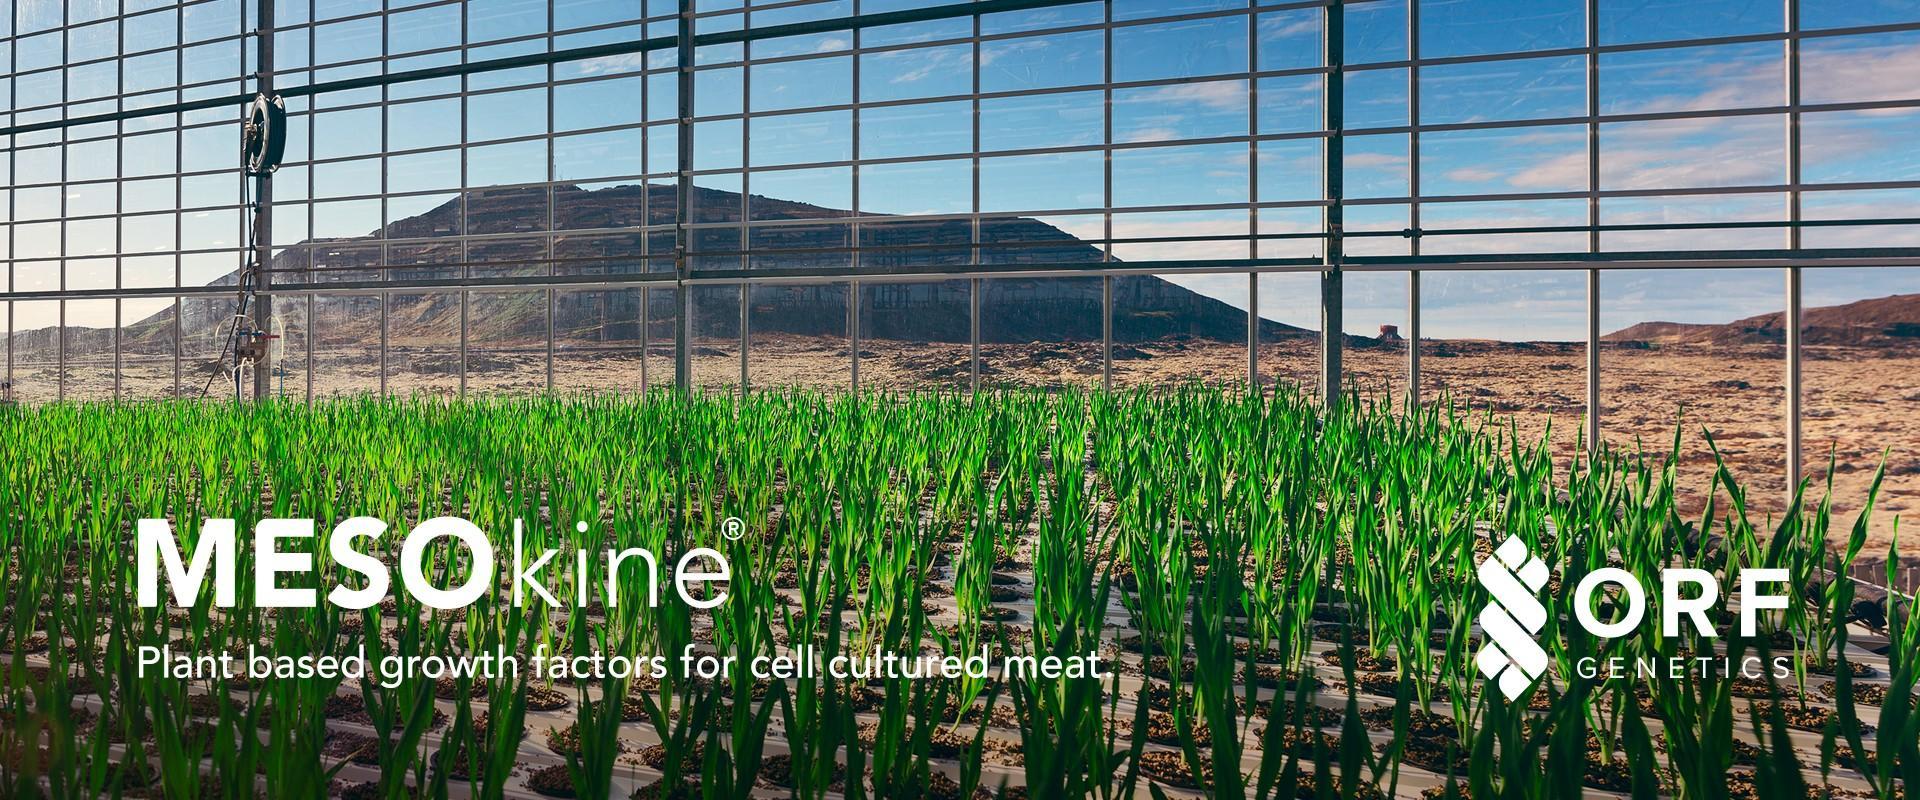 Barley growing in greenhouse